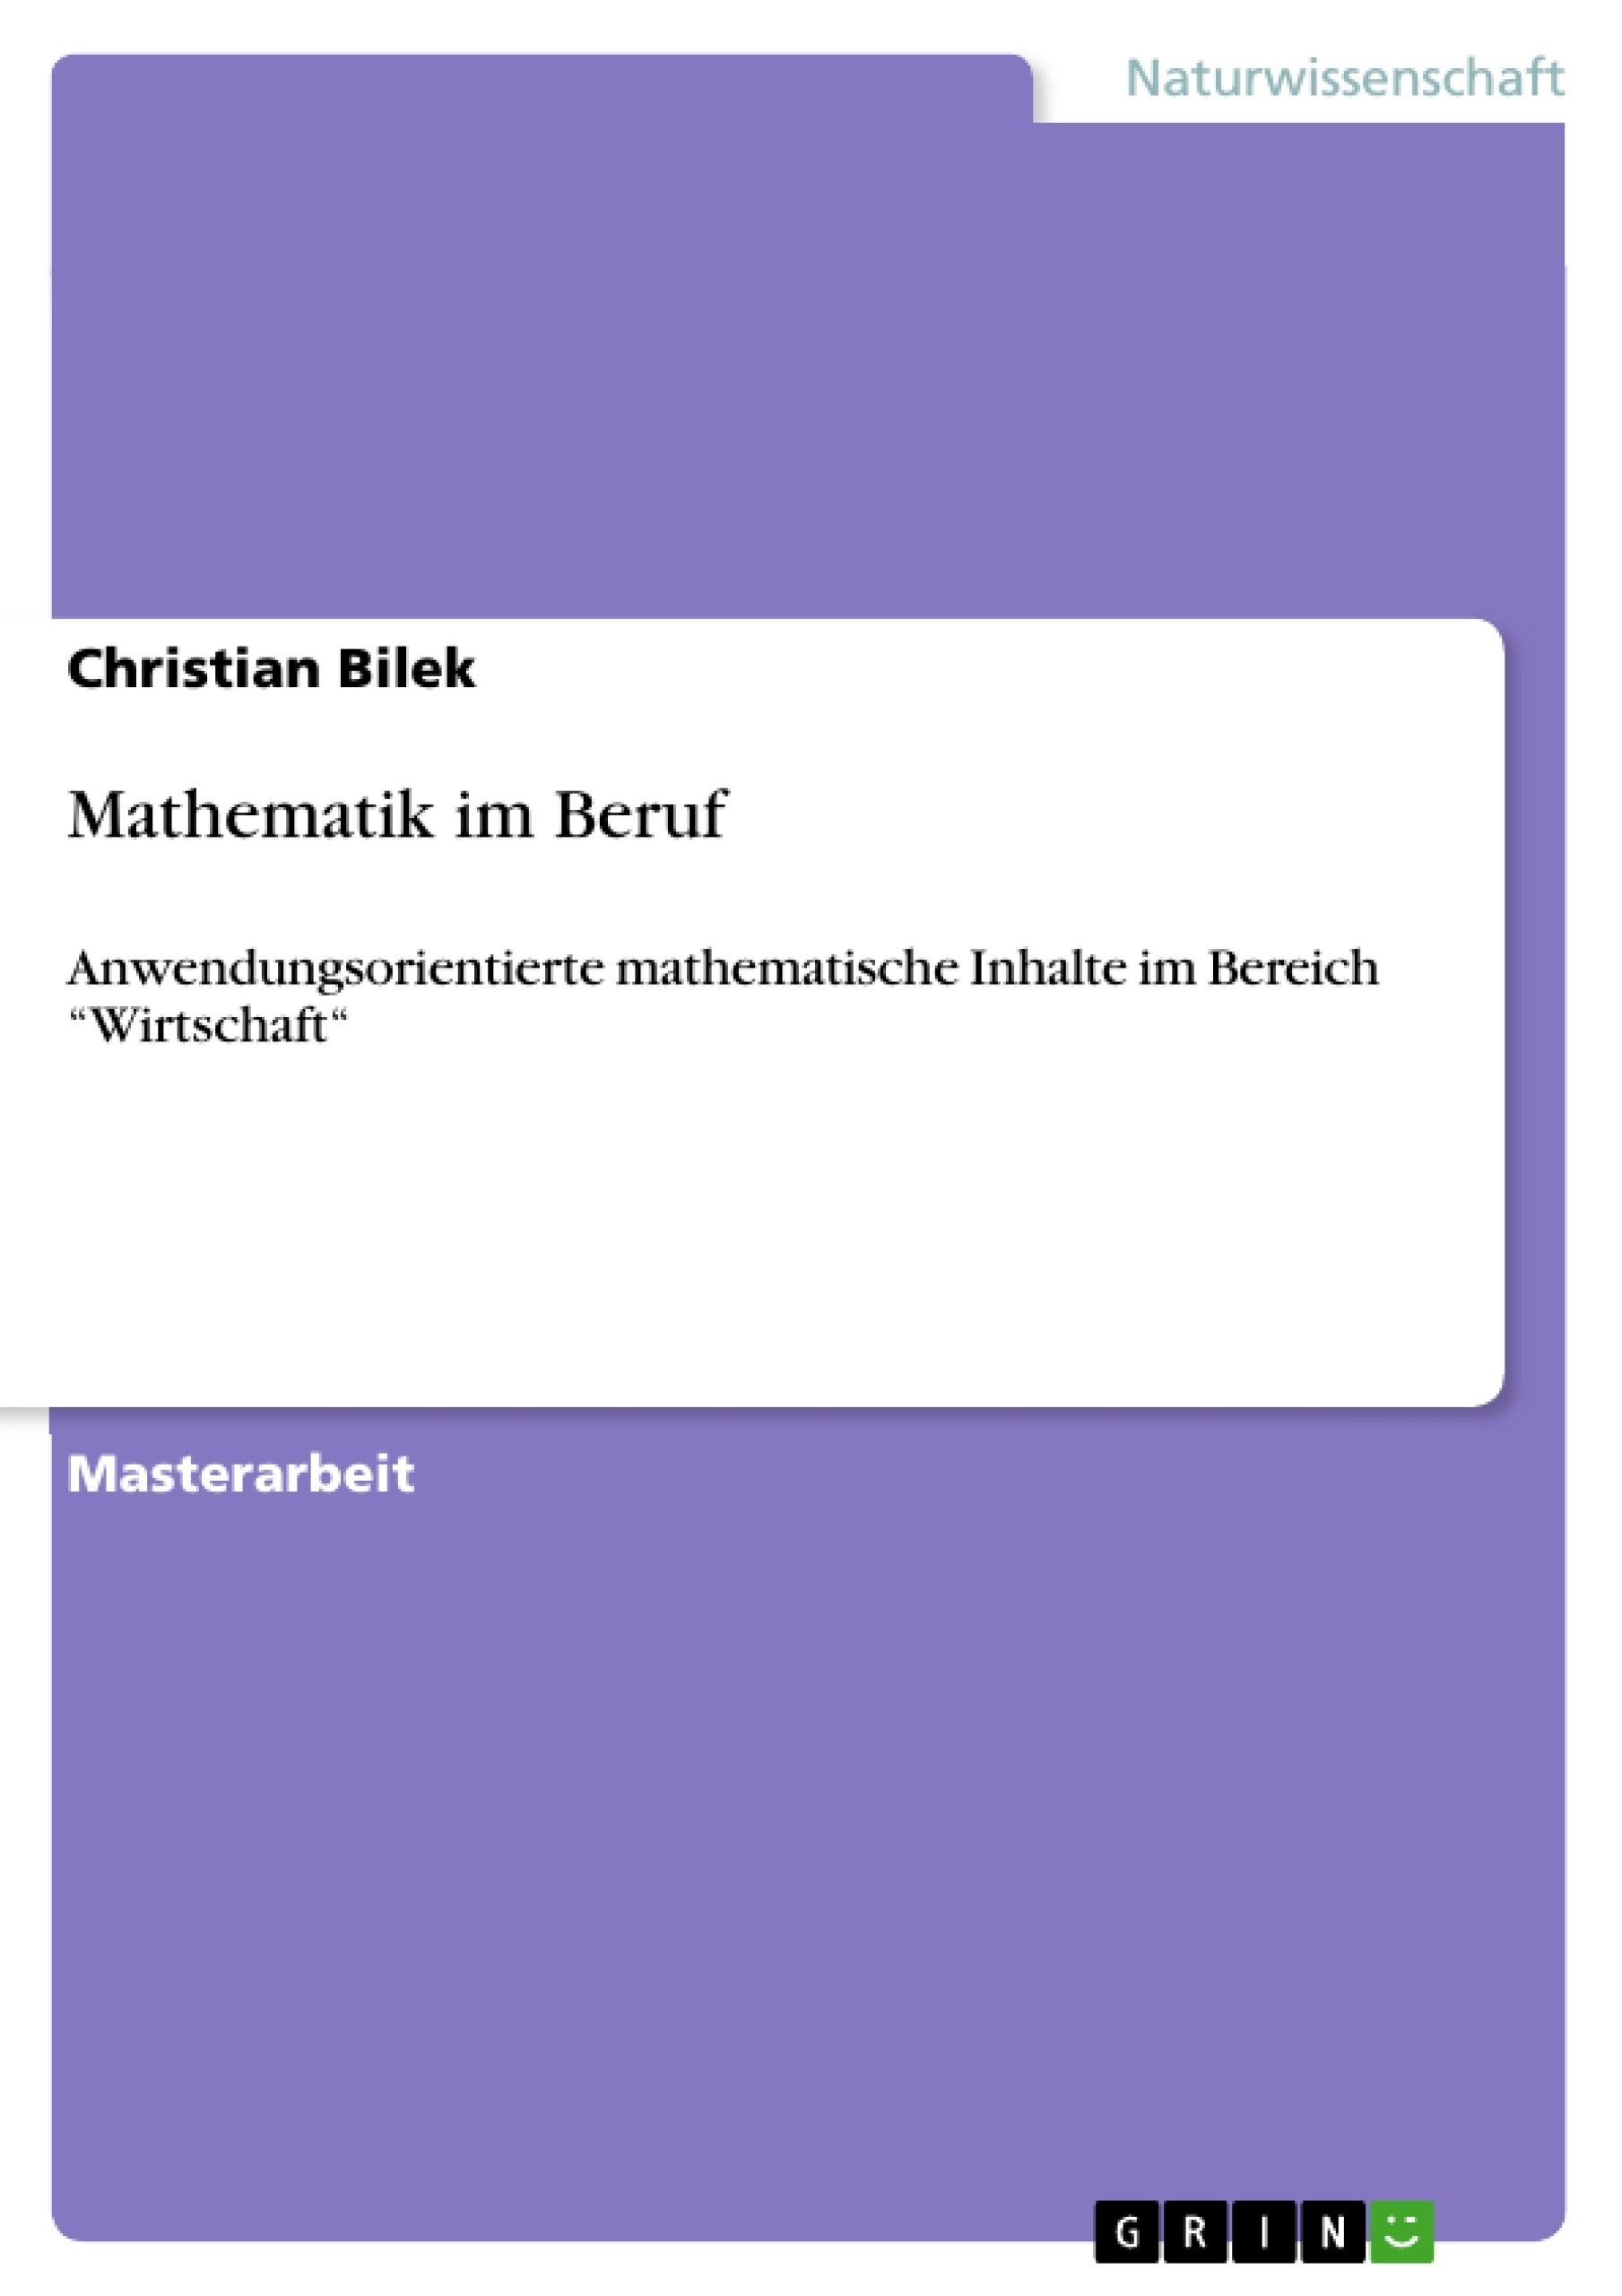 Titel: Mathematik im Beruf